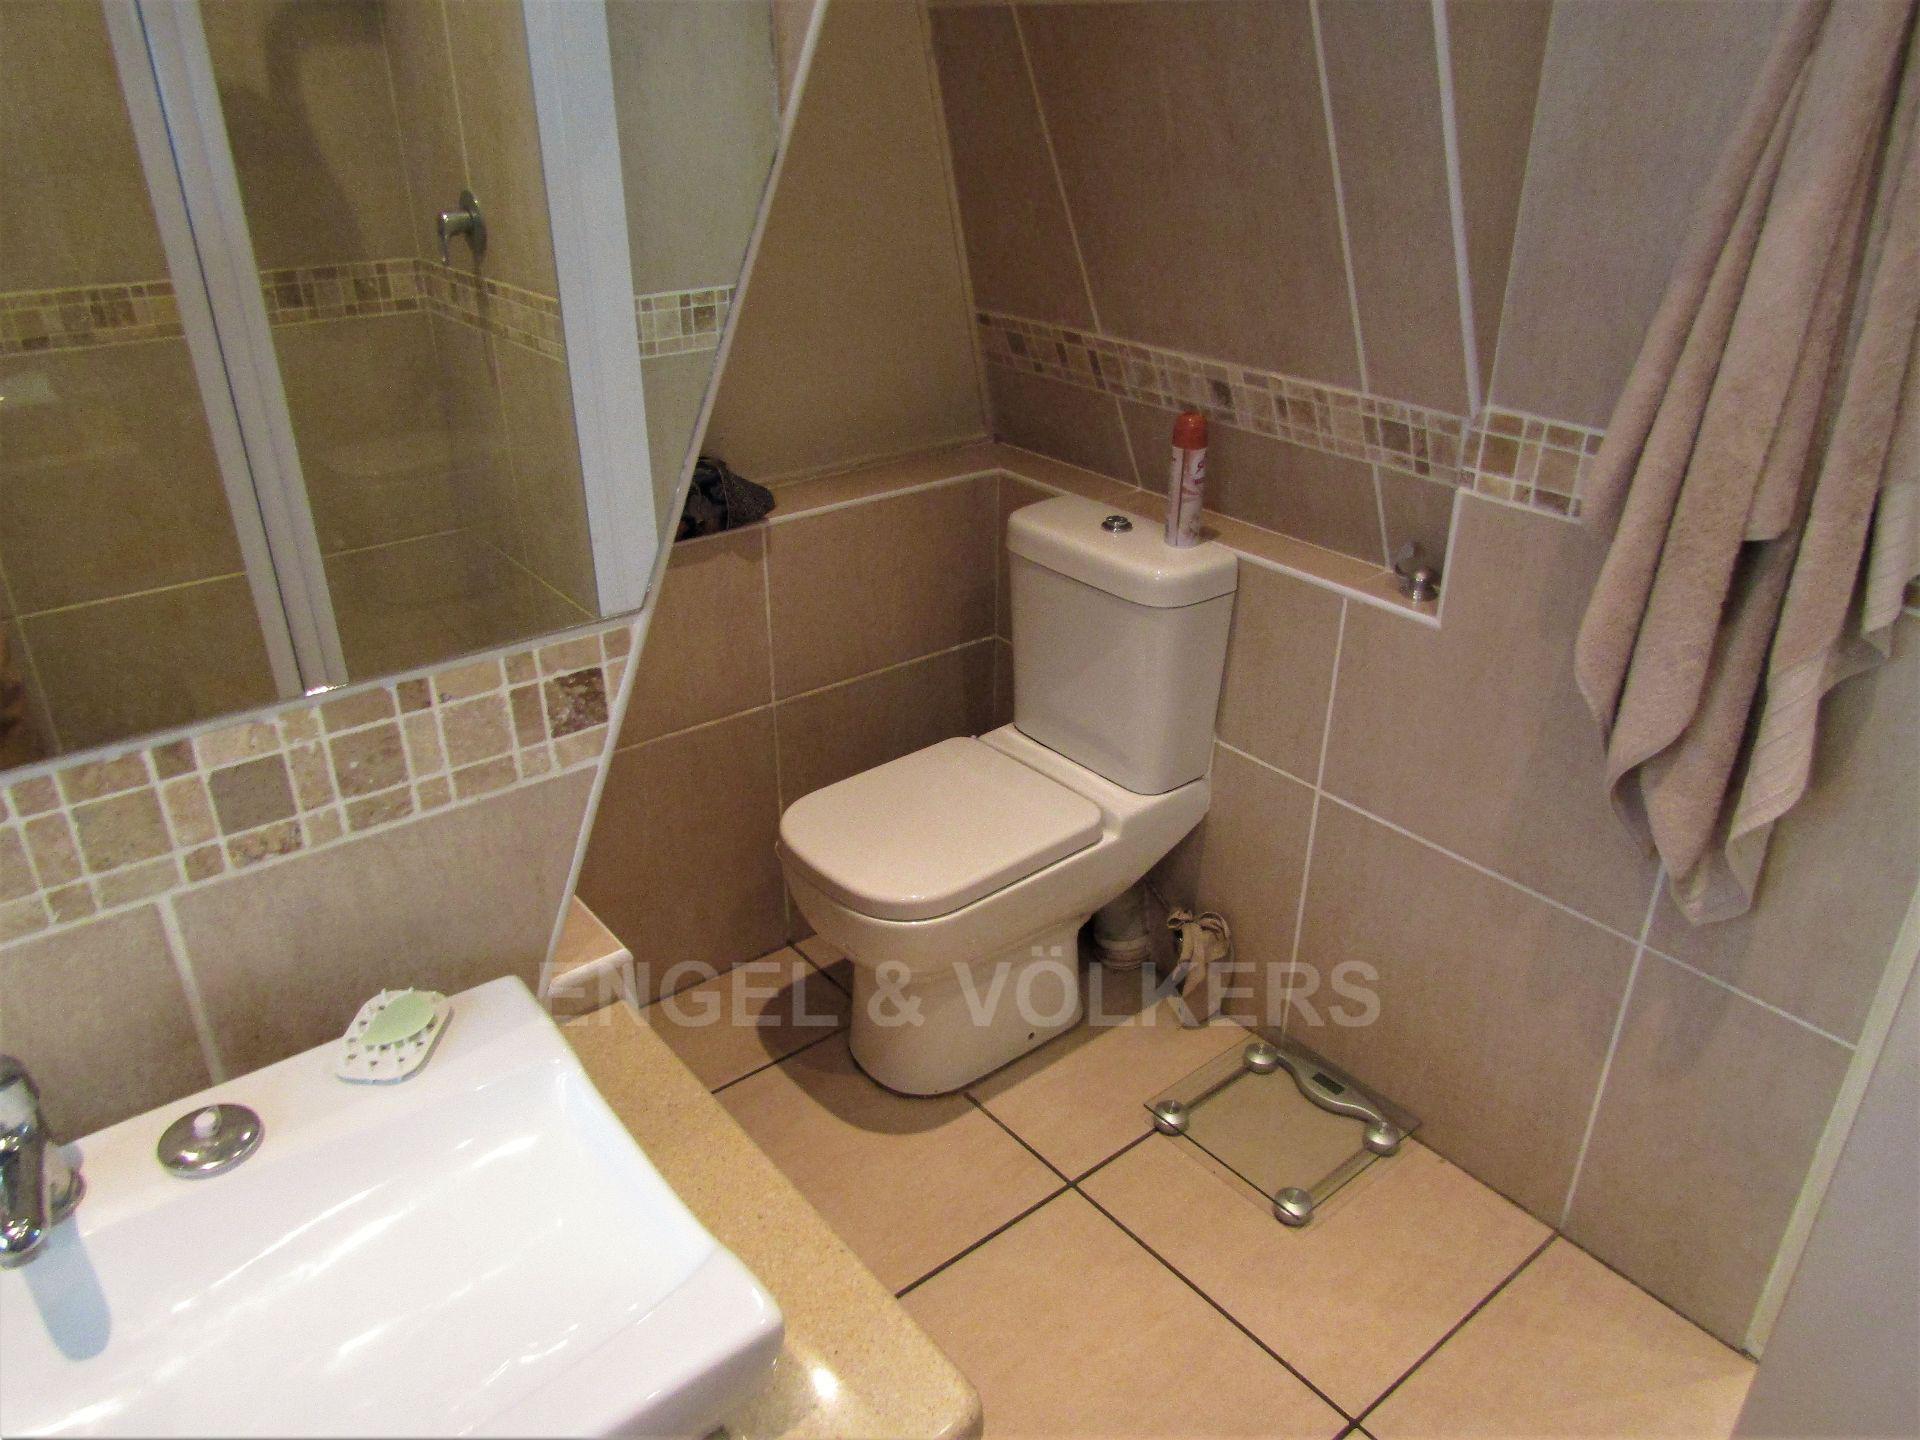 Heilige Akker property for sale. Ref No: 13555391. Picture no 16